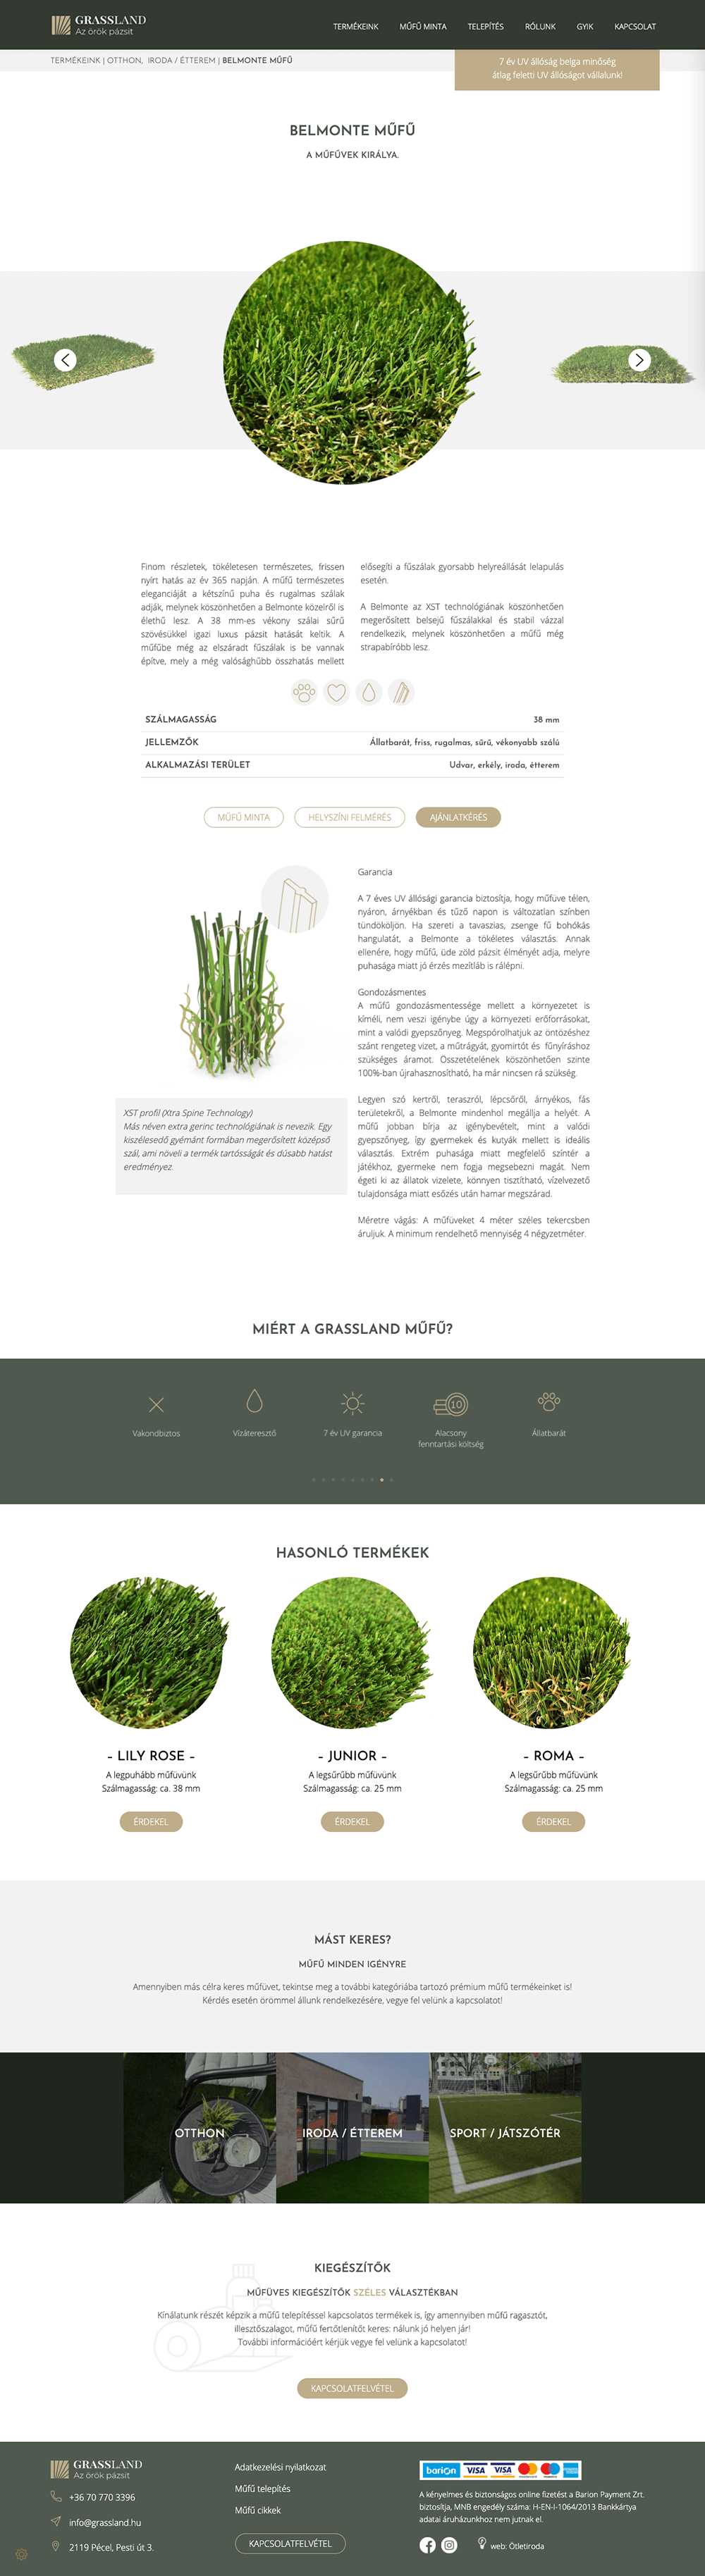 grassland-termekoldal